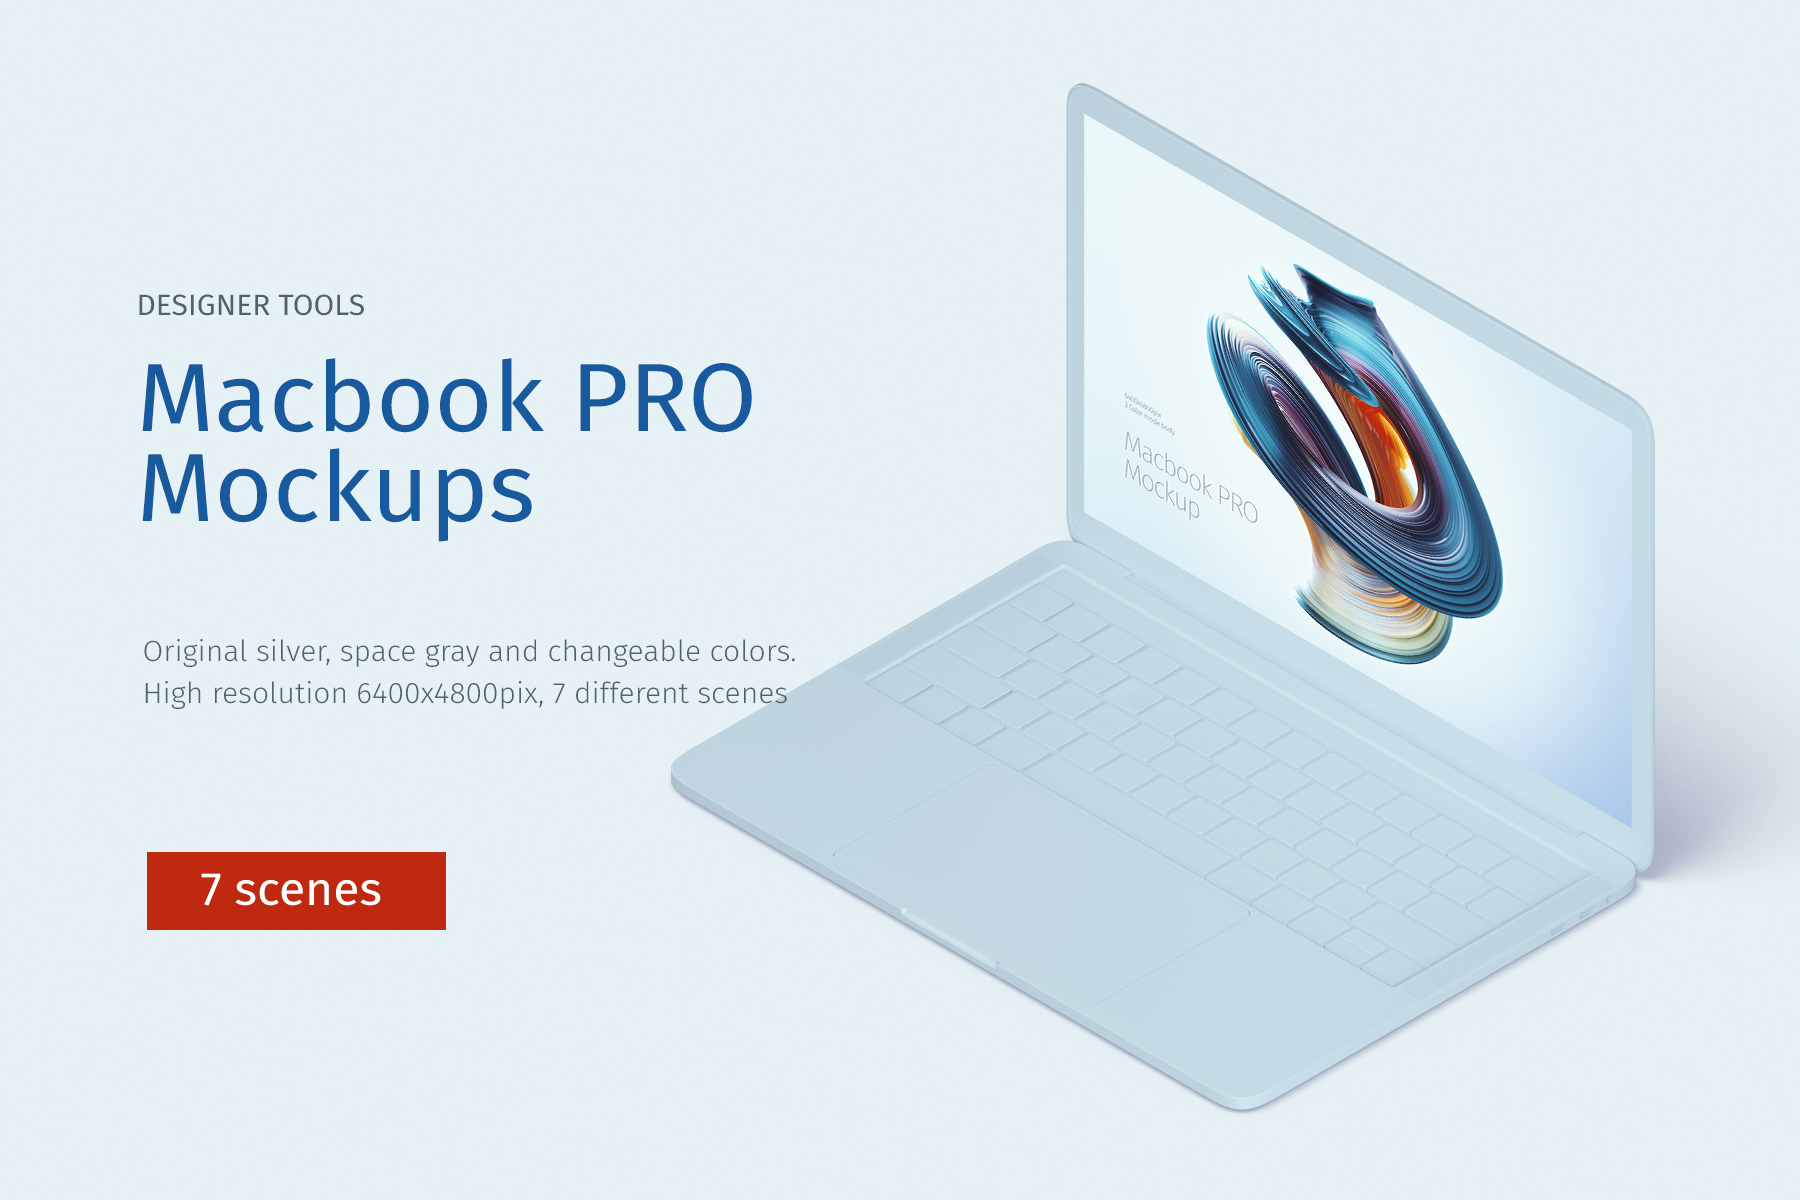 Macbook PRO Creative Mockup example image 1